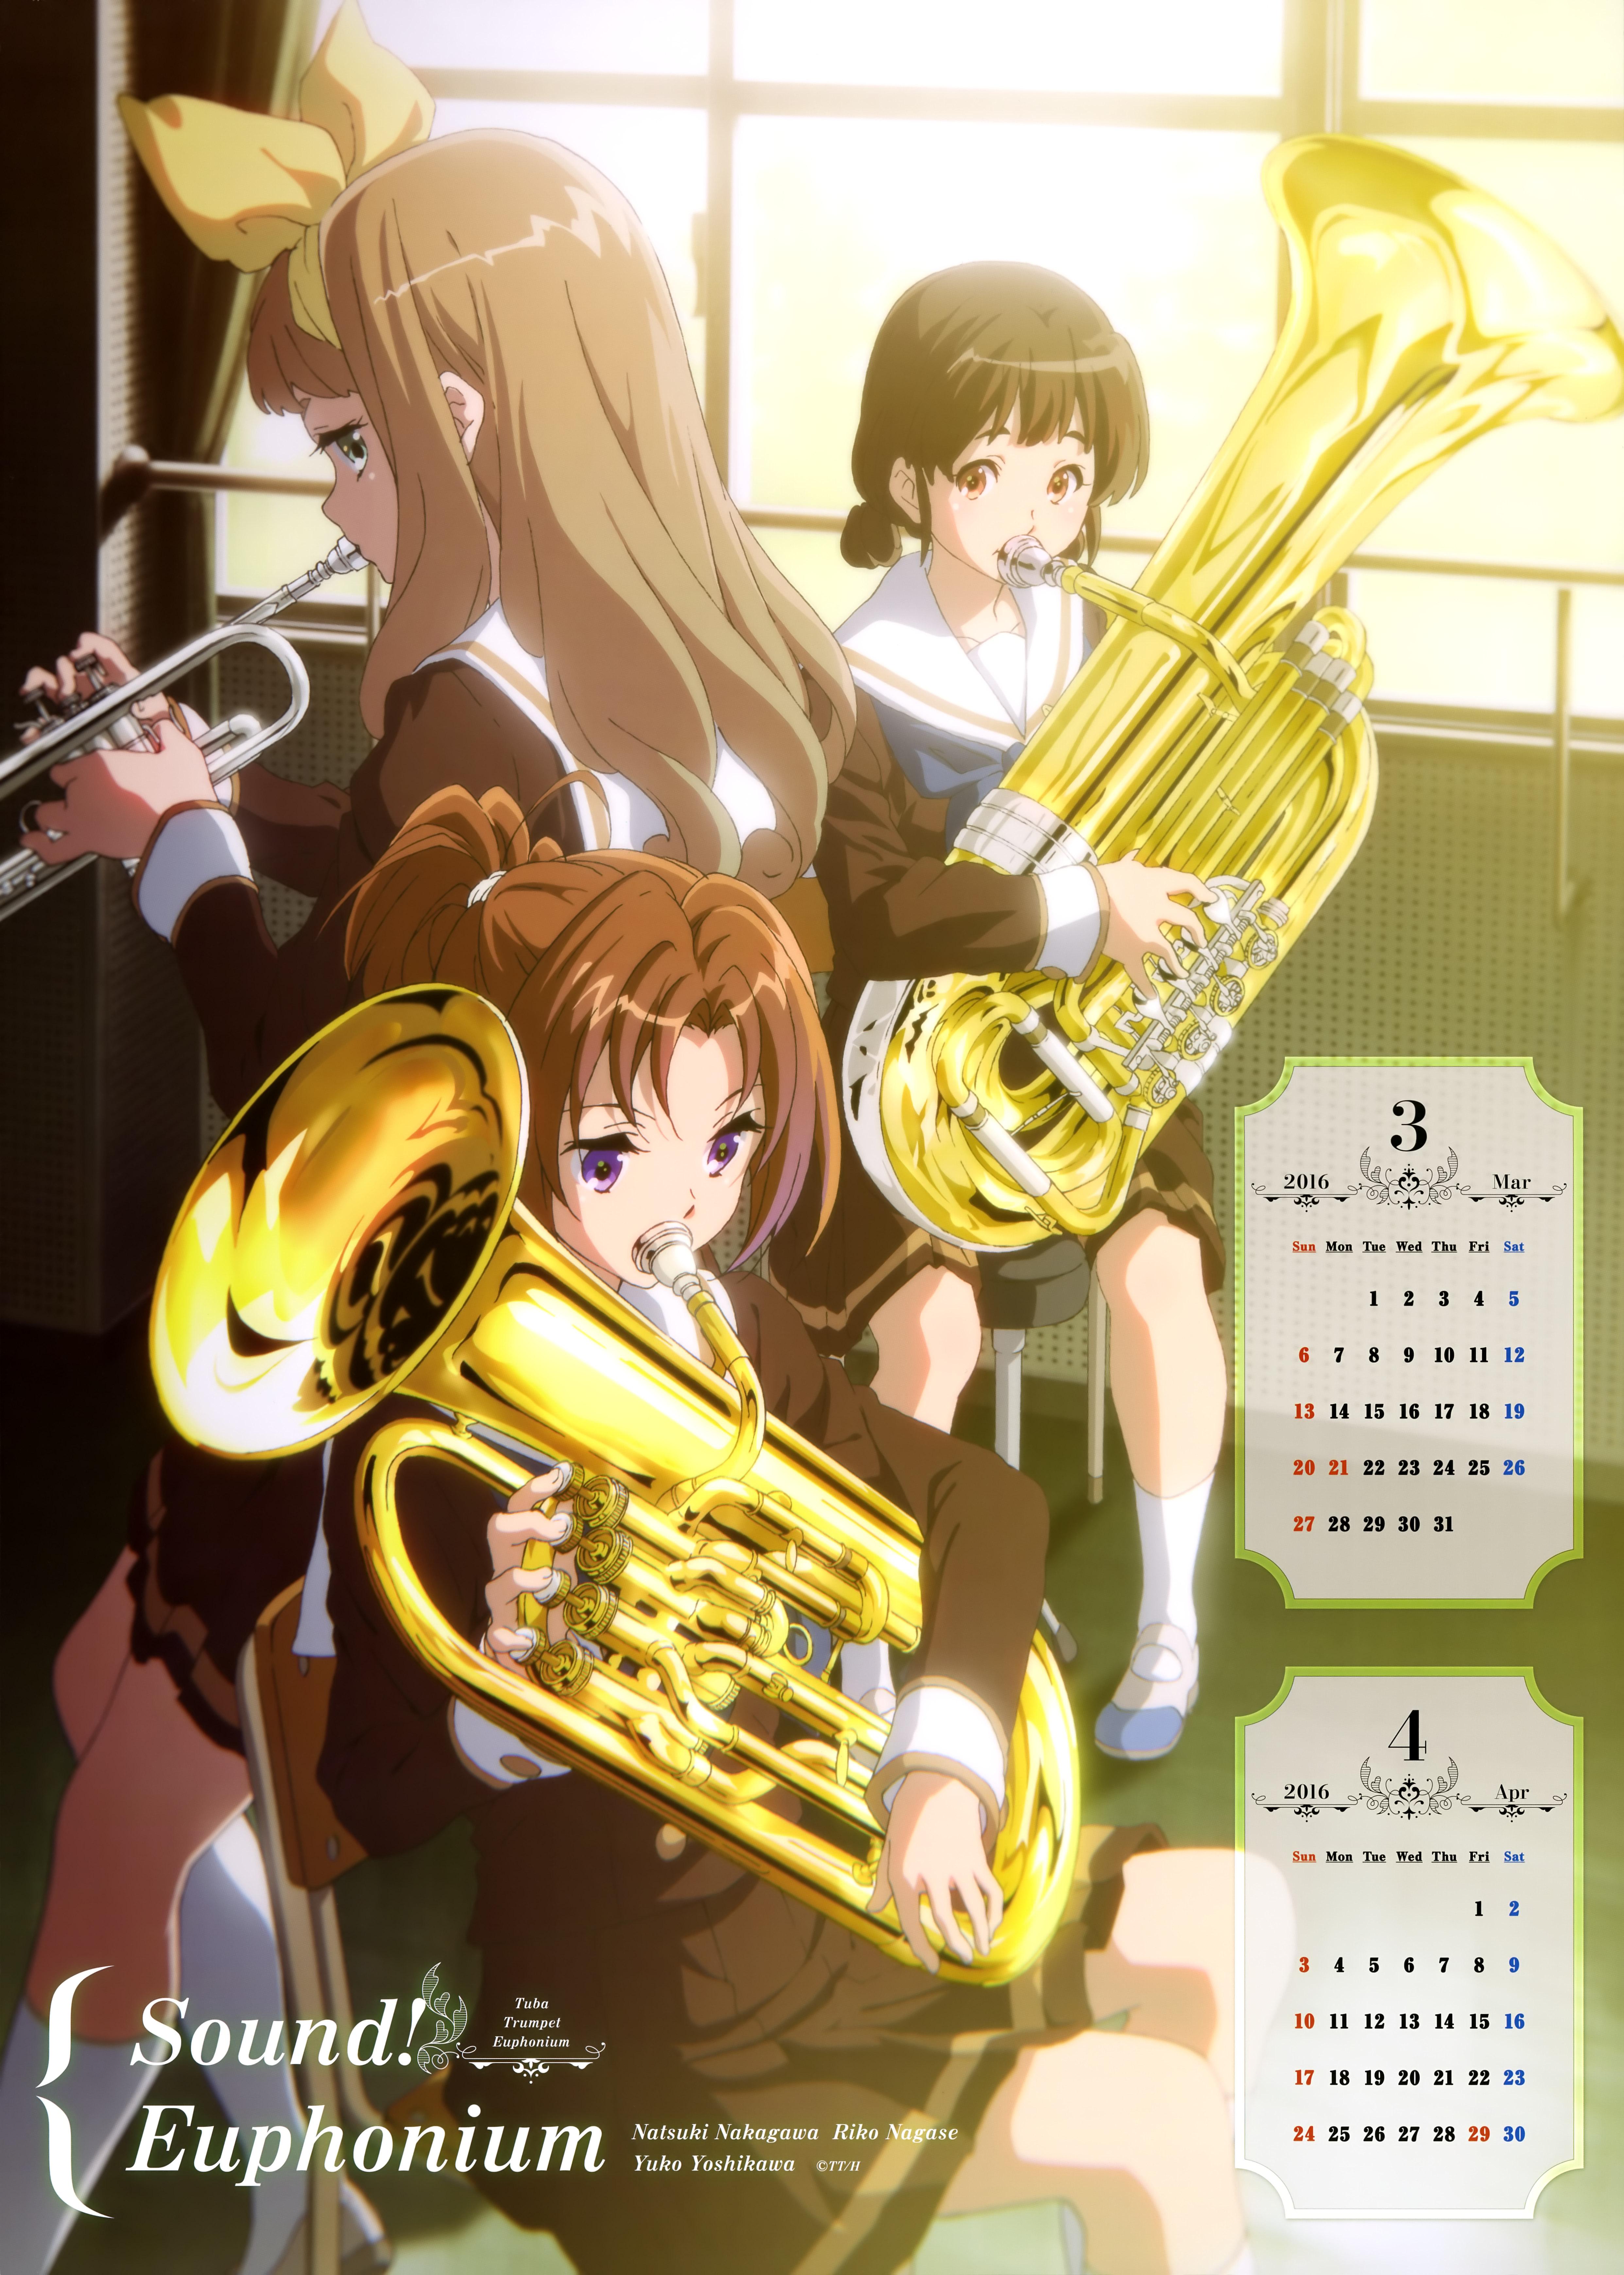 Hibike! Euphonium Anime calendar 2016 0002